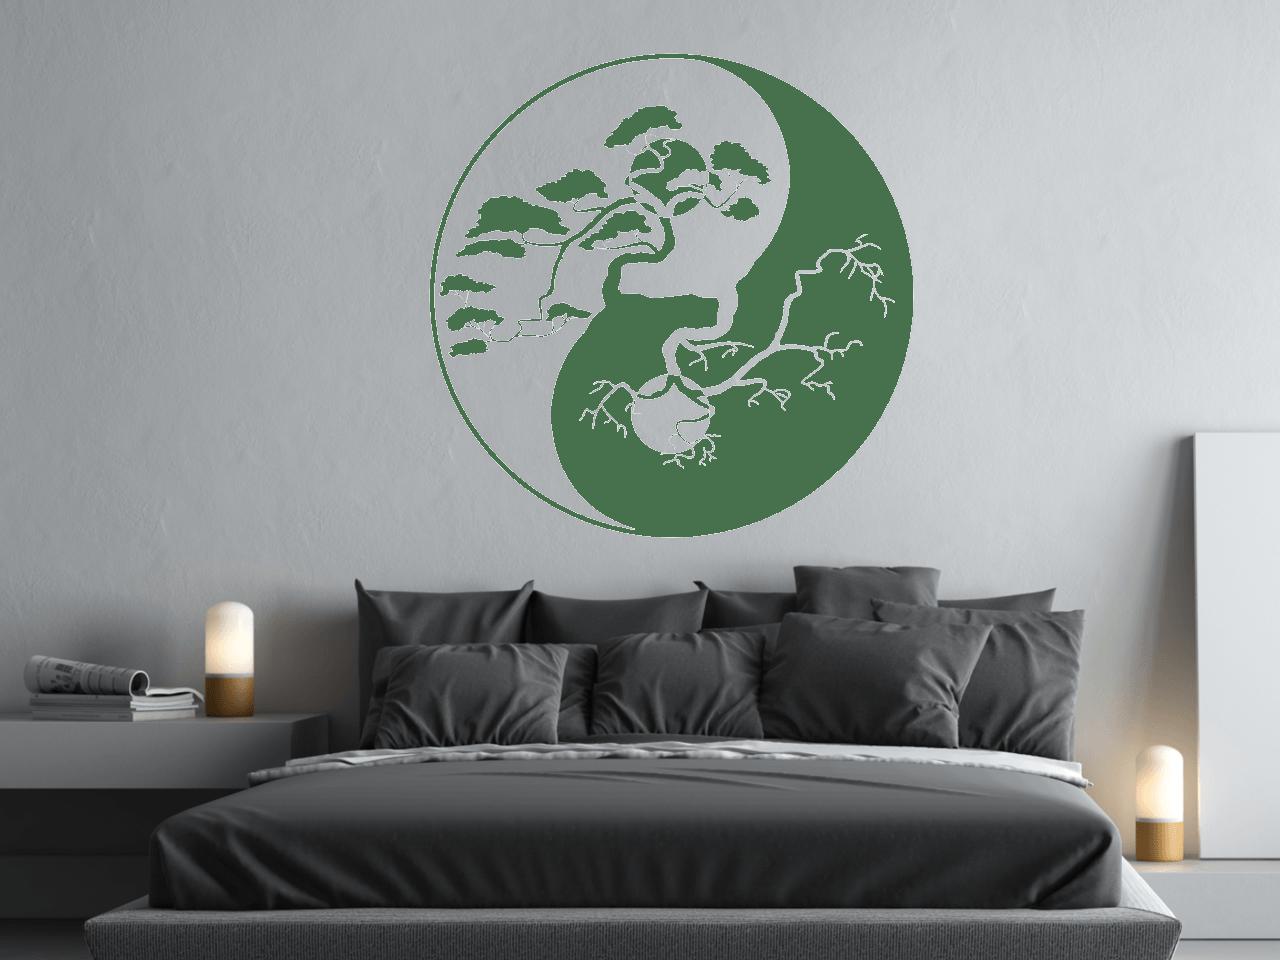 Schlafzimmer yin yang verschiedene ideen for Bett yin yang